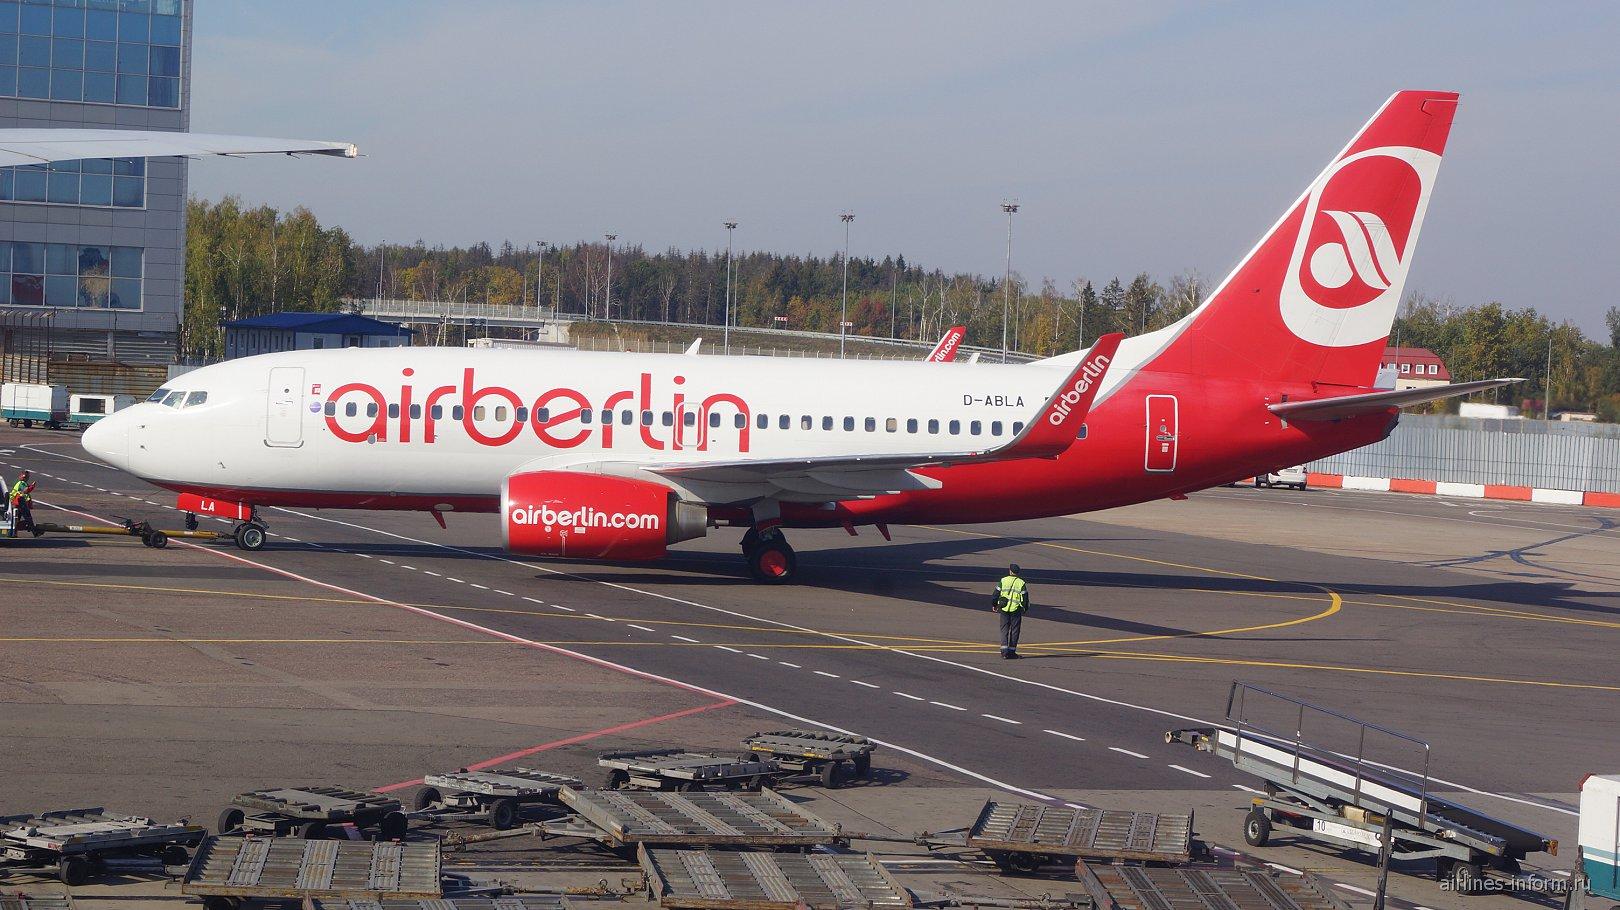 Boeing 737-700 авиакомпании Air Berlin в аэропорту Москва Домодедово